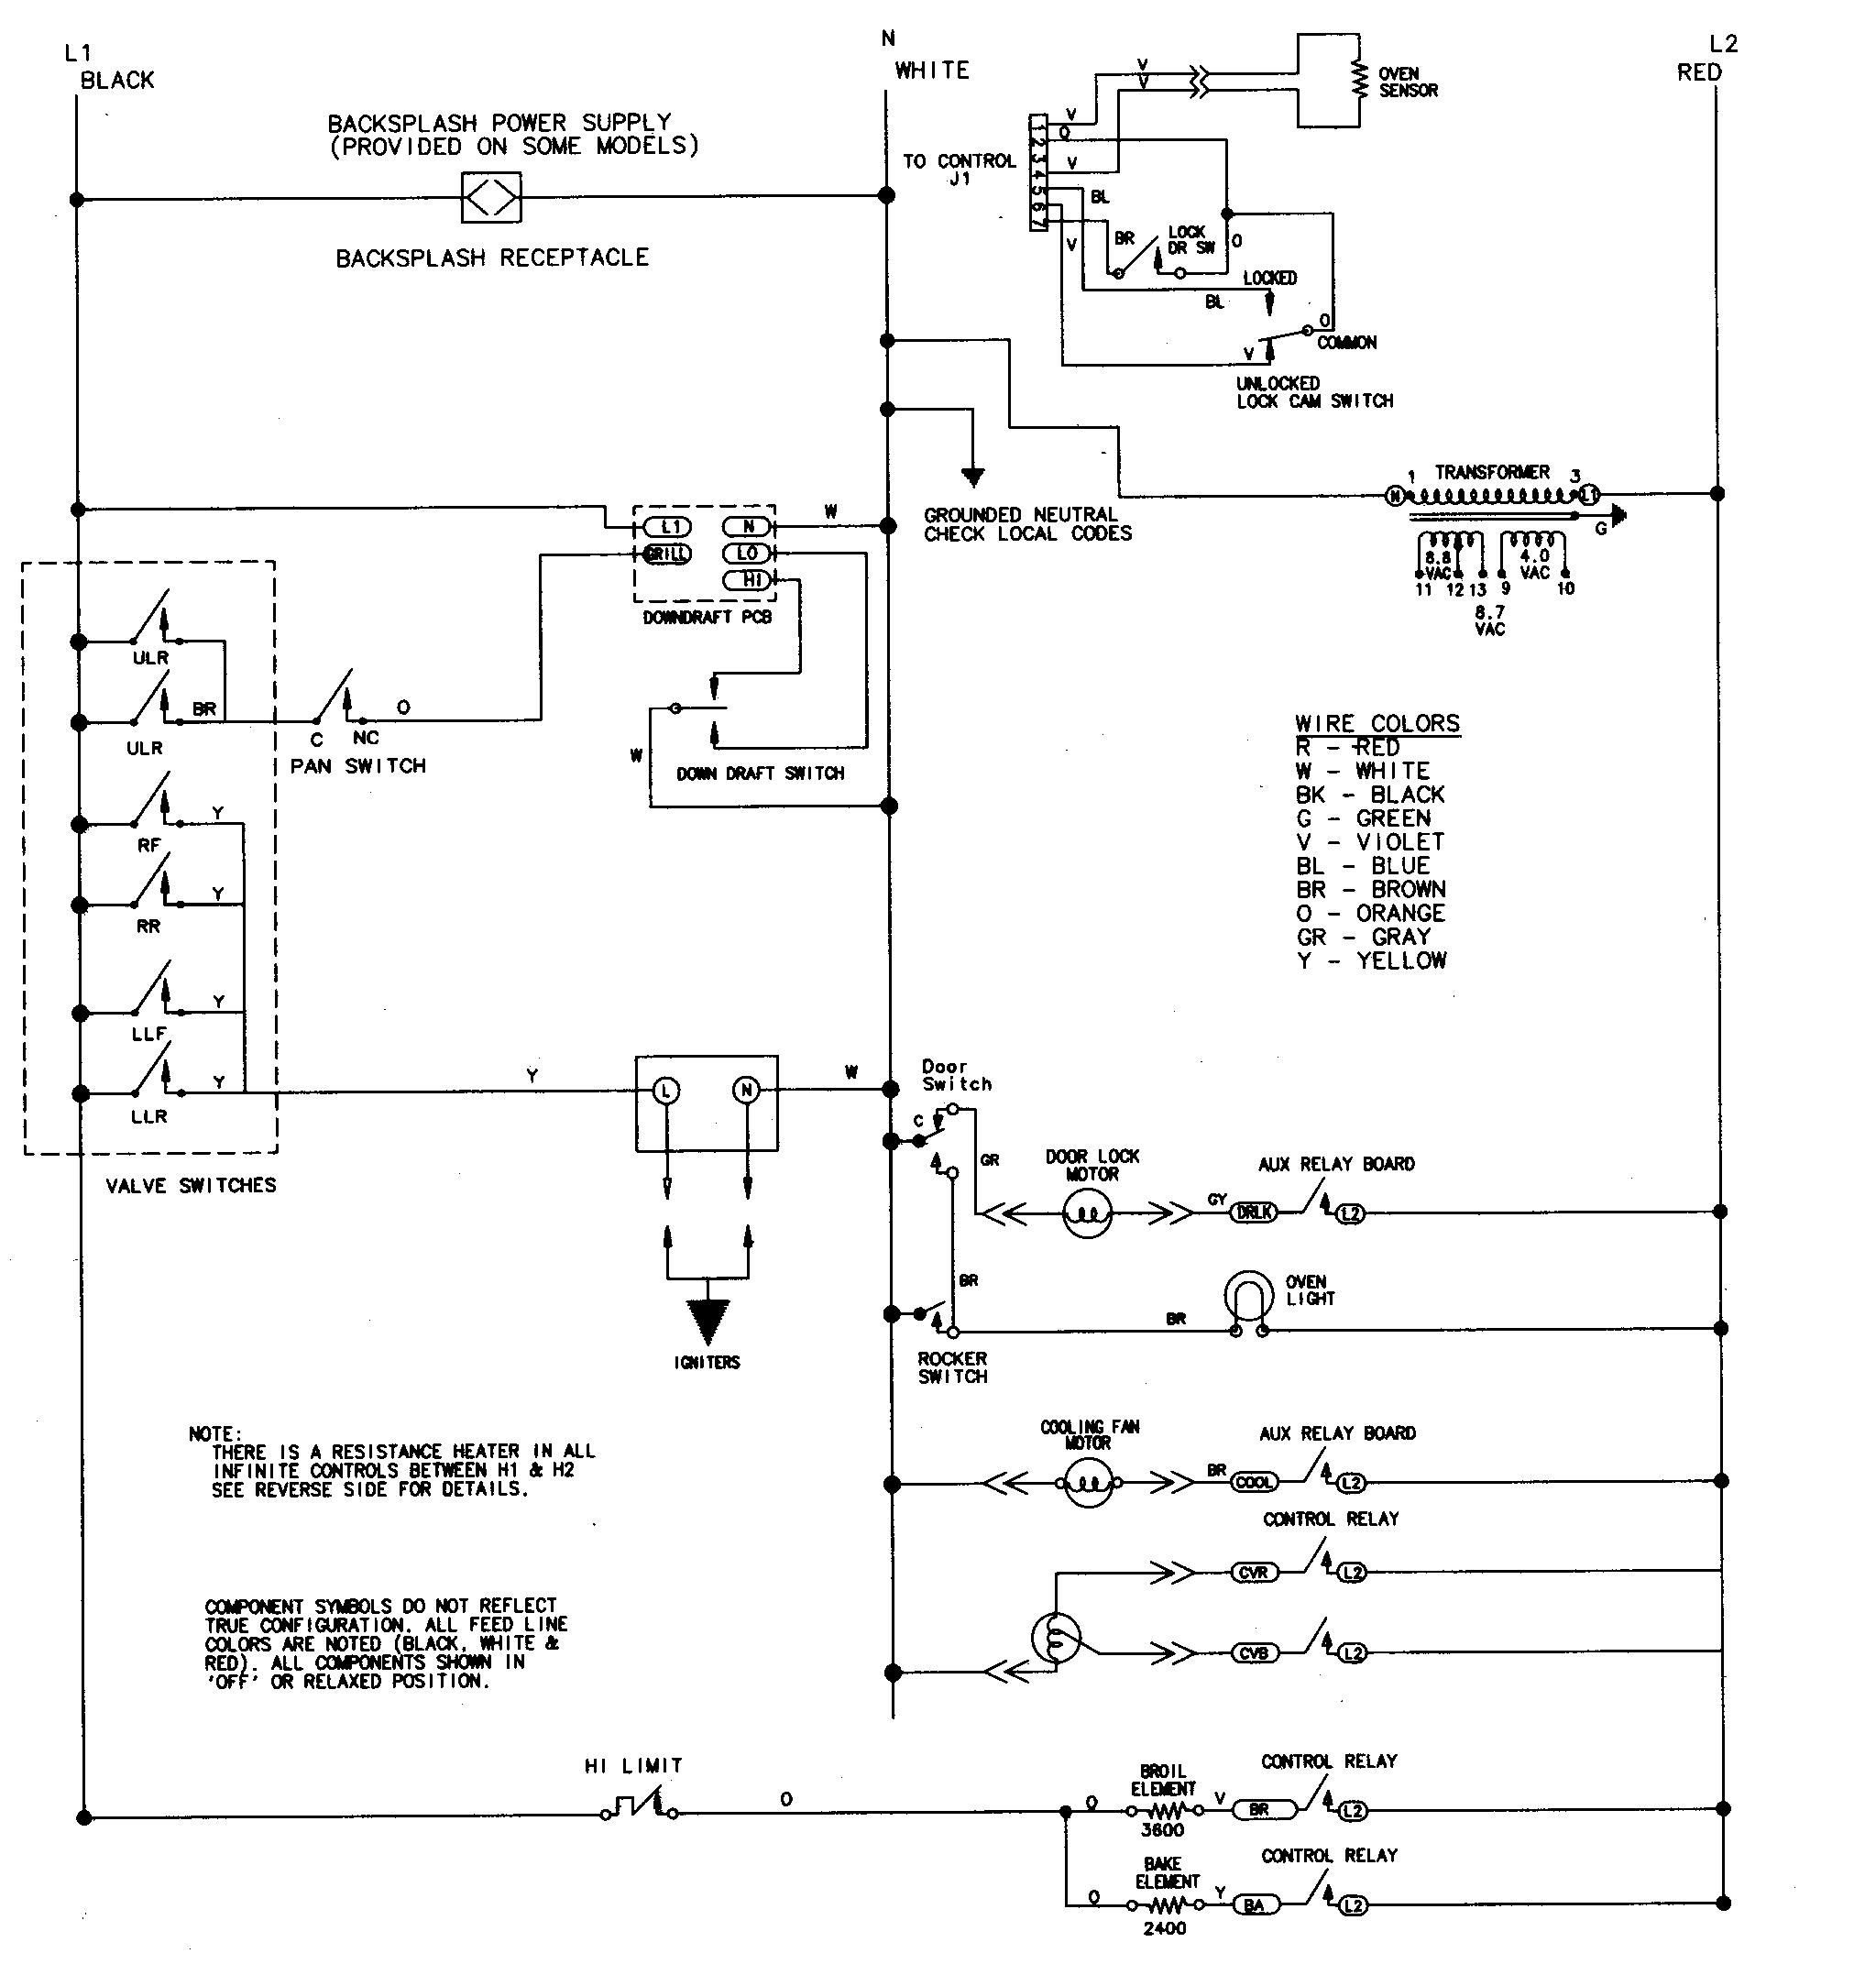 Pellet Stove Thermostat Wiring Diagram Jenn Air Svd48600p Gas Electric Slide In Range Timer